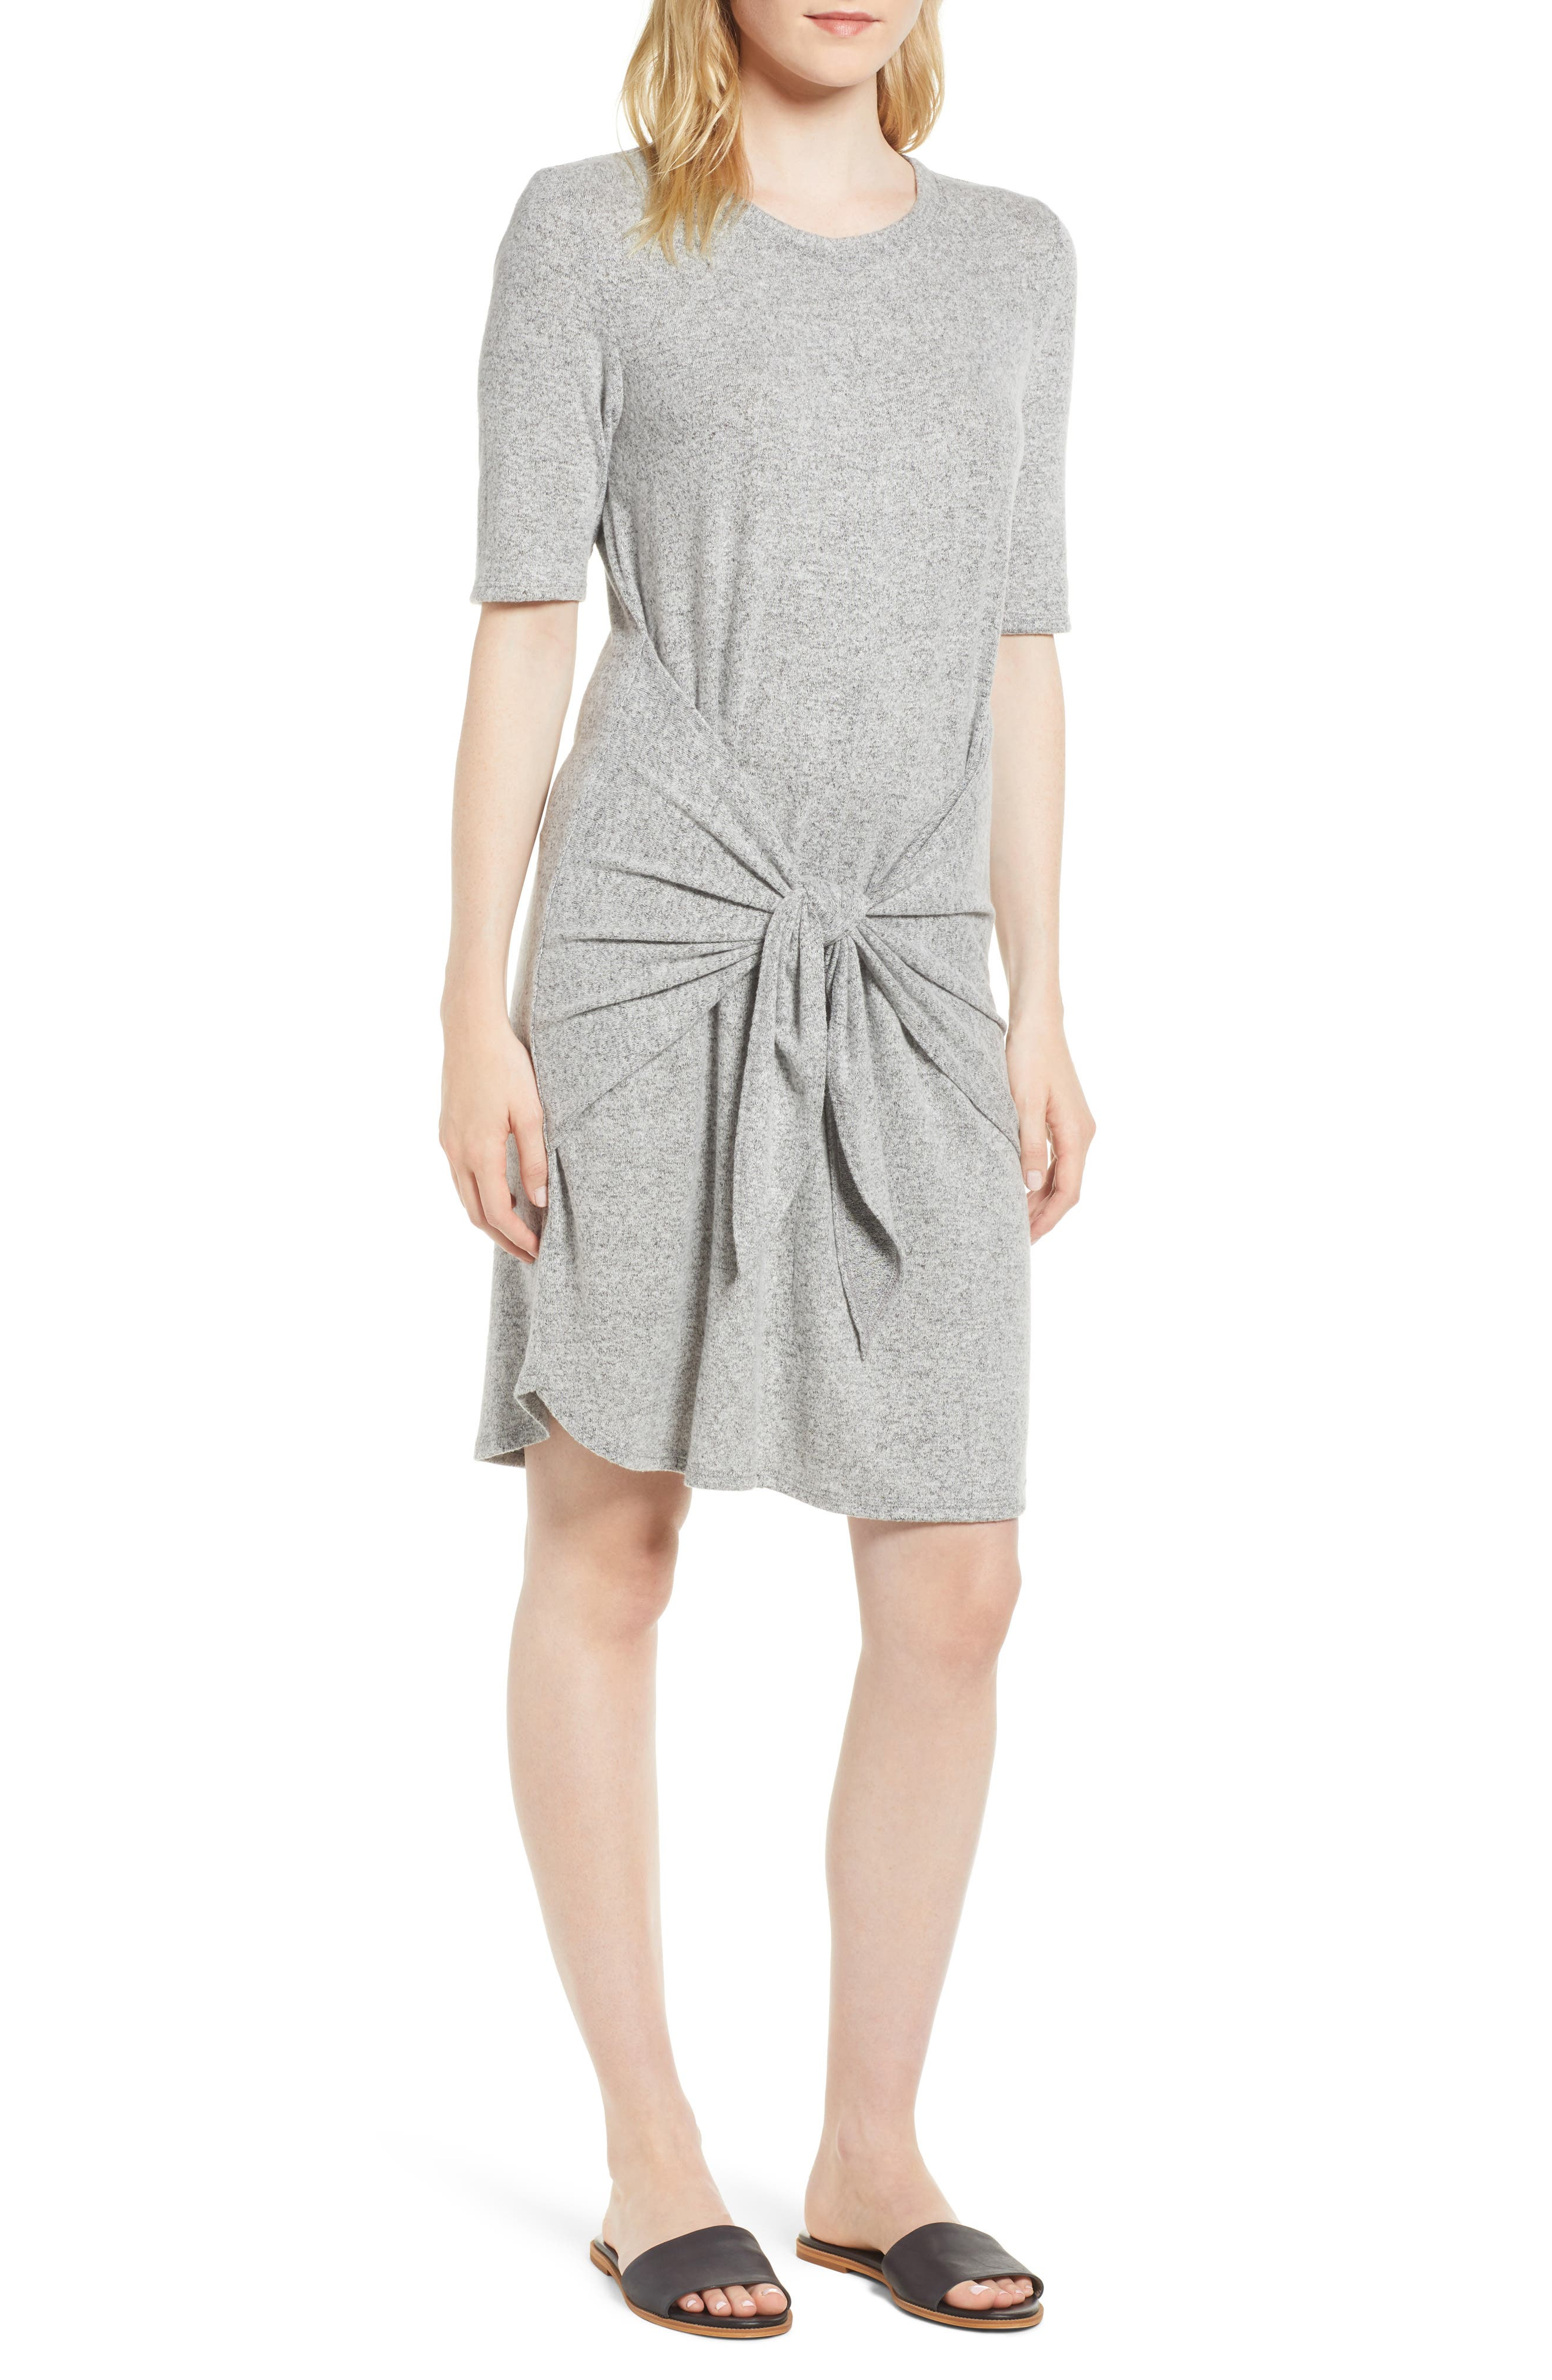 Caslon Off-Duty Tie Front Knit Dress,                         Main,                         color, Grey Heather